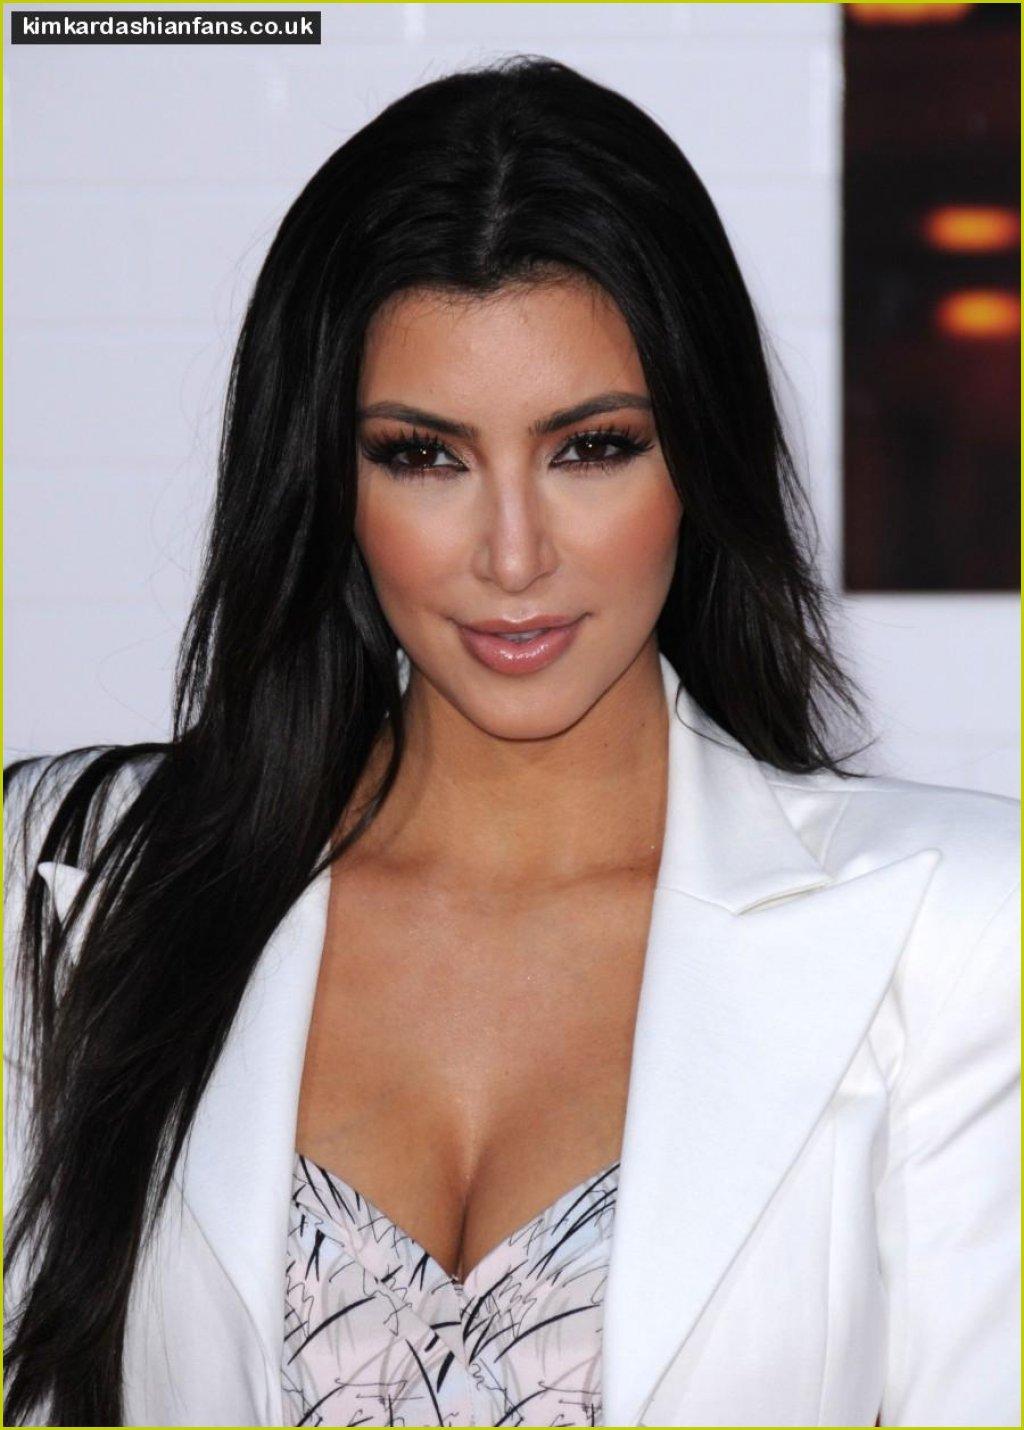 http://1.bp.blogspot.com/-eZ8VNbHJZ7I/UPHhrj3yubI/AAAAAAAAFR8/tFQcXFkIA1k/s1600/160463_kim_kardashian_no_clothes.jpg